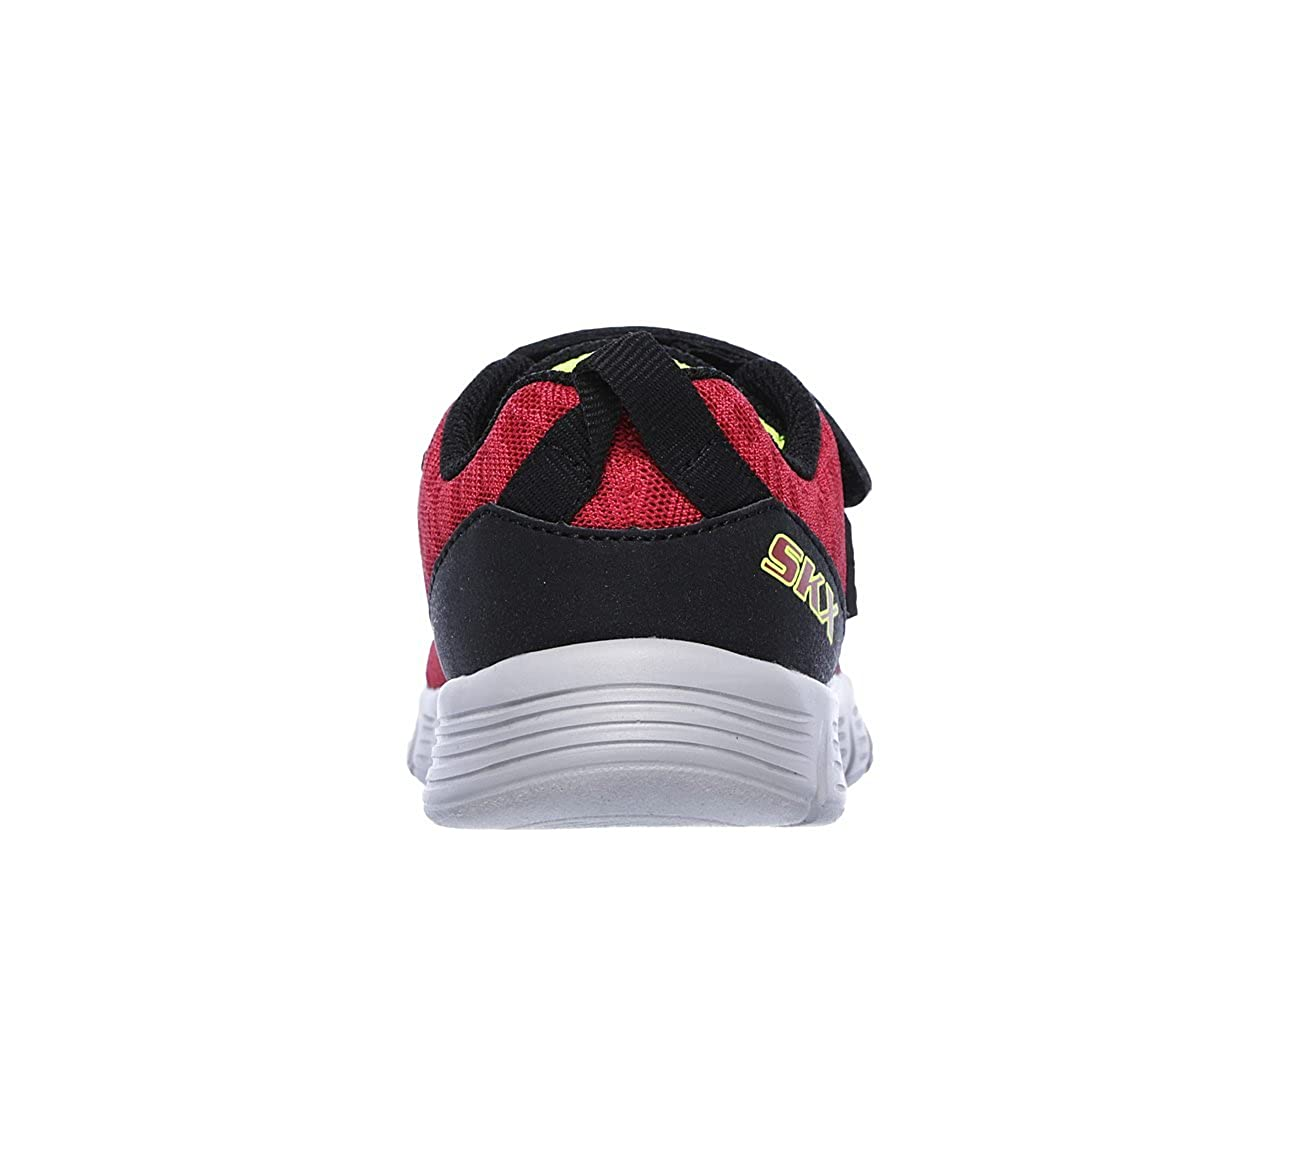 ONEYUAN Children Vintage Black Cats Kitten Kid Casual Lightweight Sport Shoes Sneakers Walking Athletic Shoes